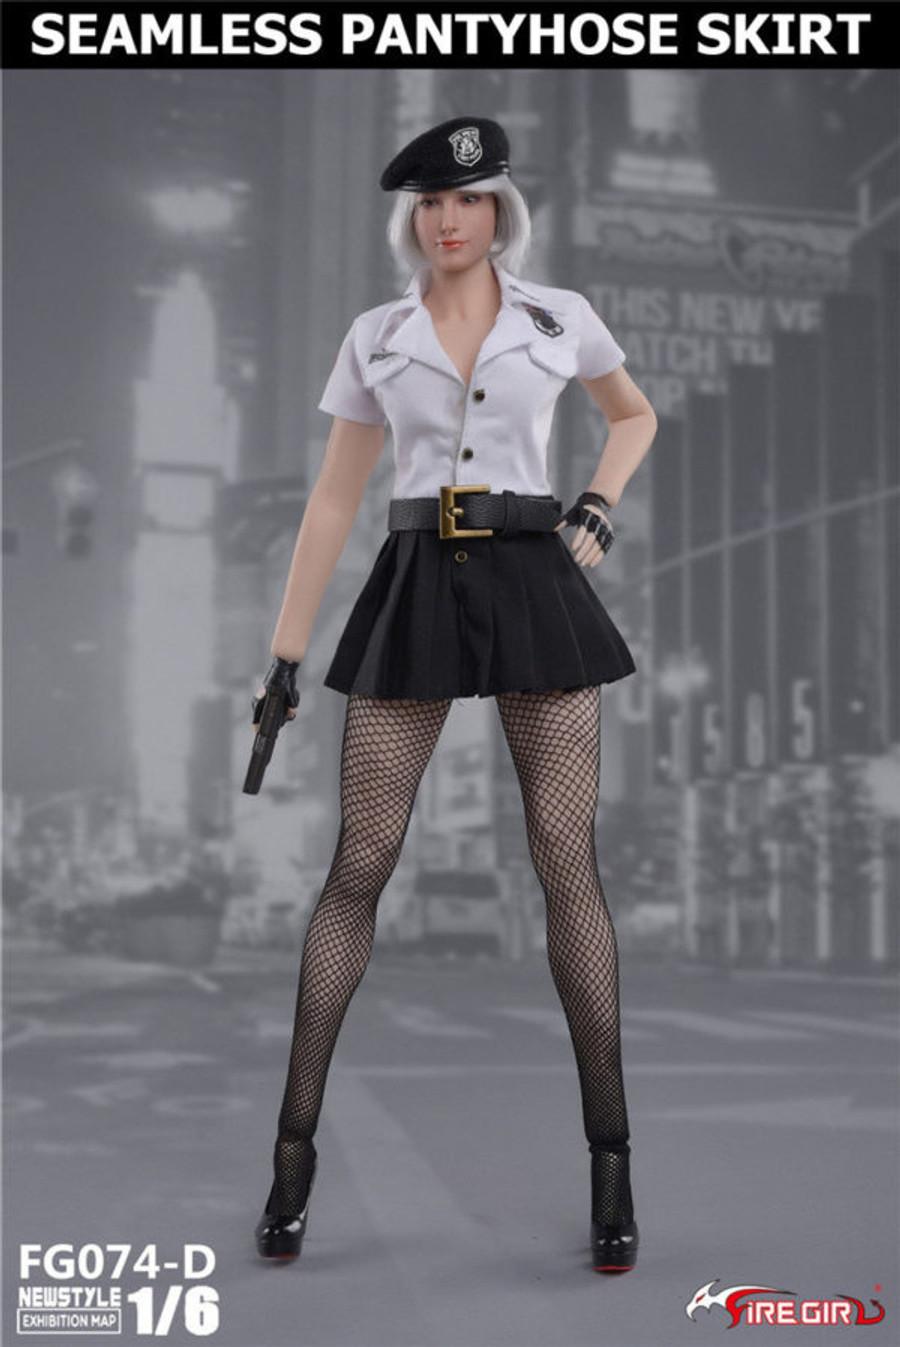 Fire Girl Toys - Seamless Pantyhose Skirt